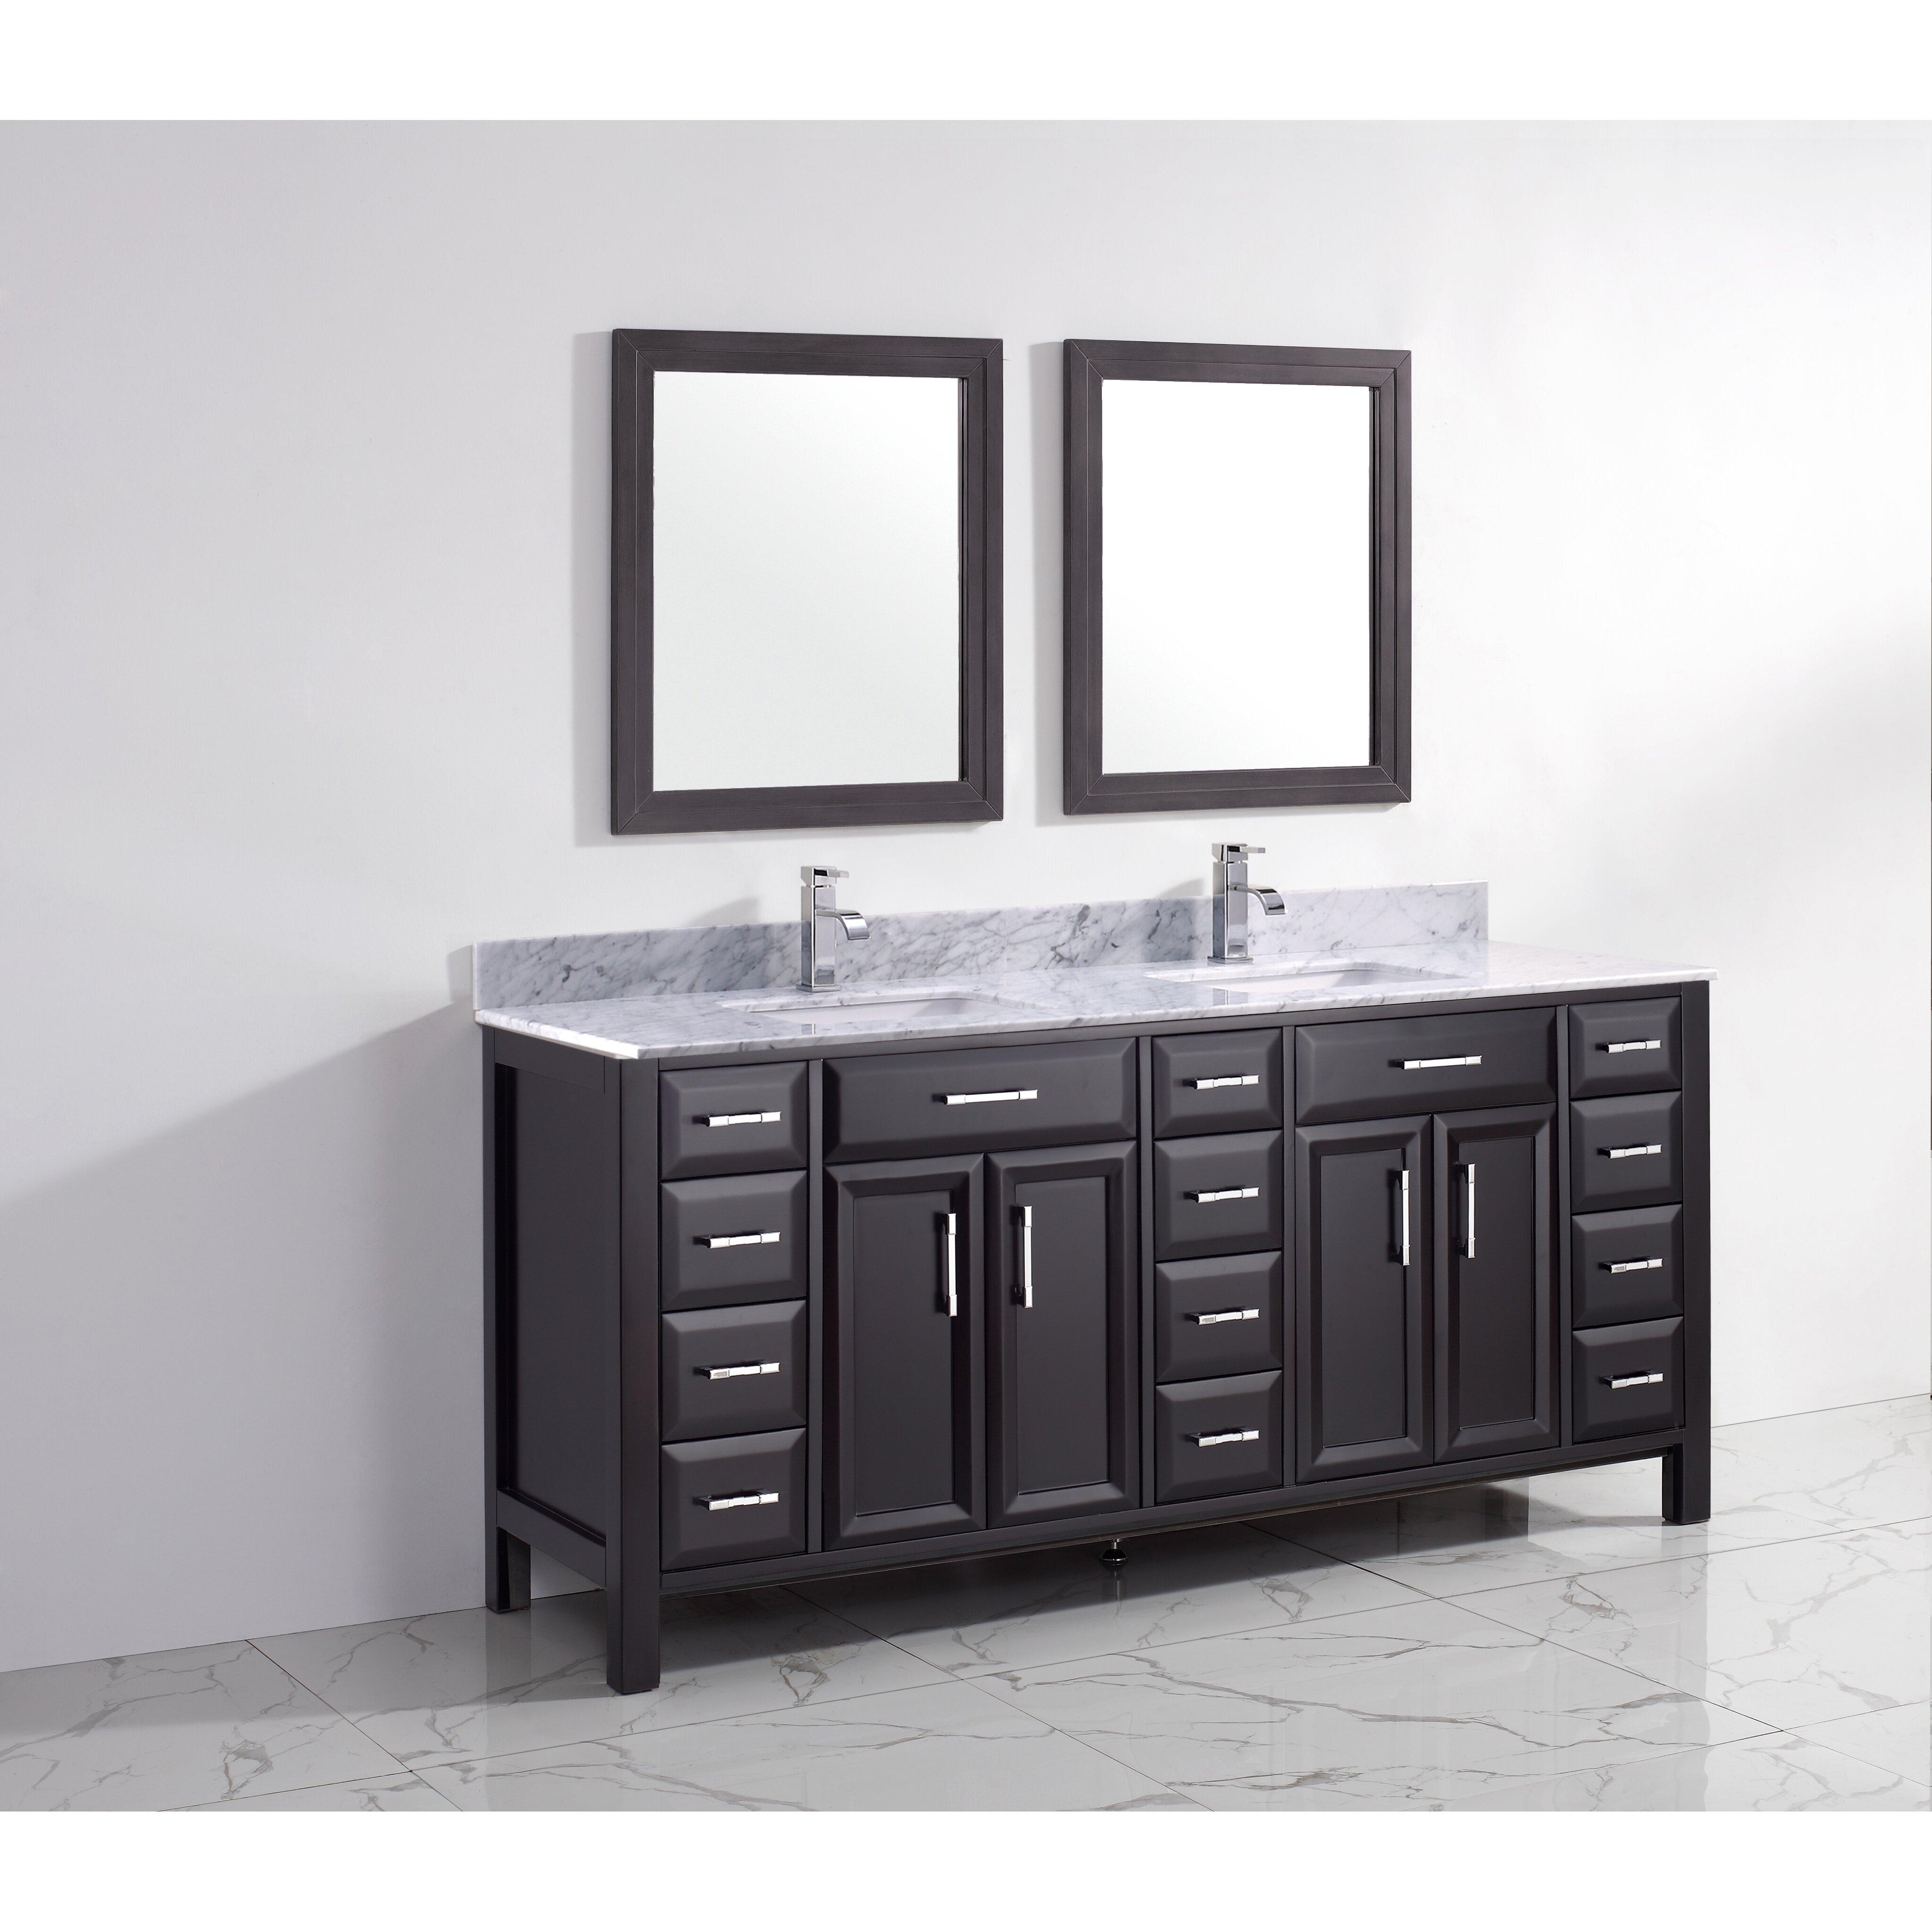 Bauhaus Bath Caledonia 75 Double Bathroom Vanity Set Reviews Wayfair